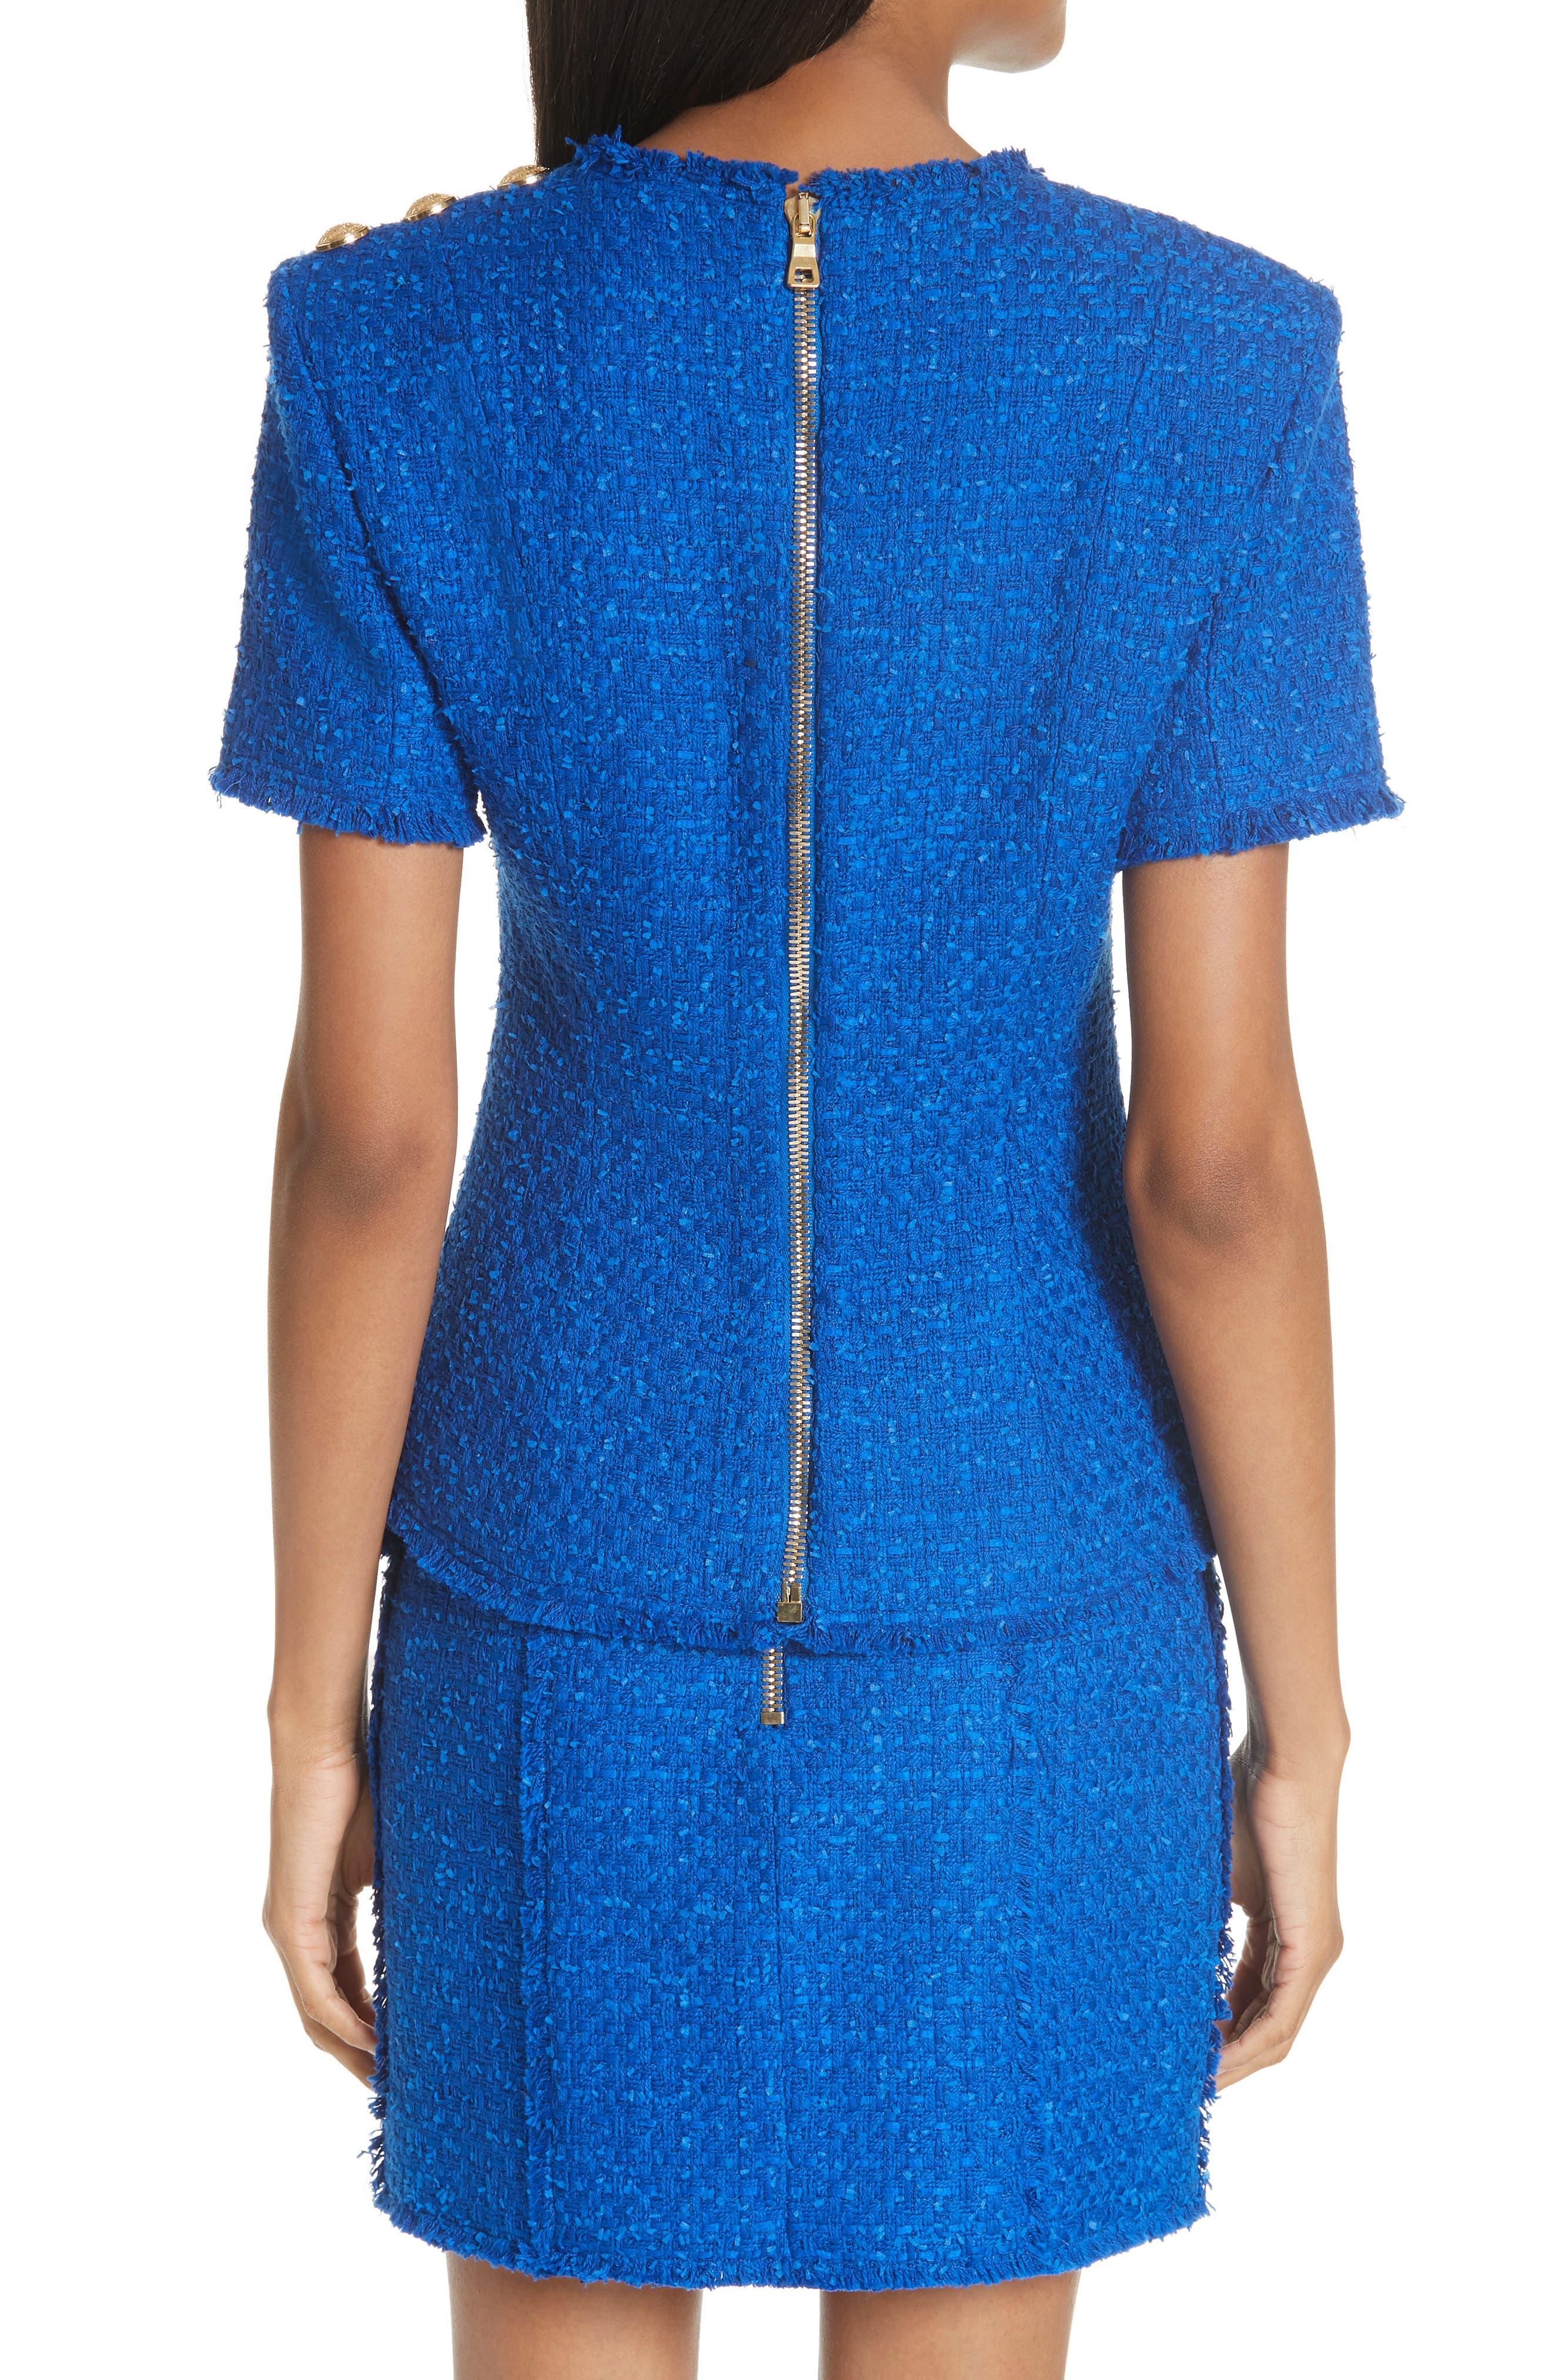 Alternate Image 2  - Balmain Button Shoulder Tweed Top